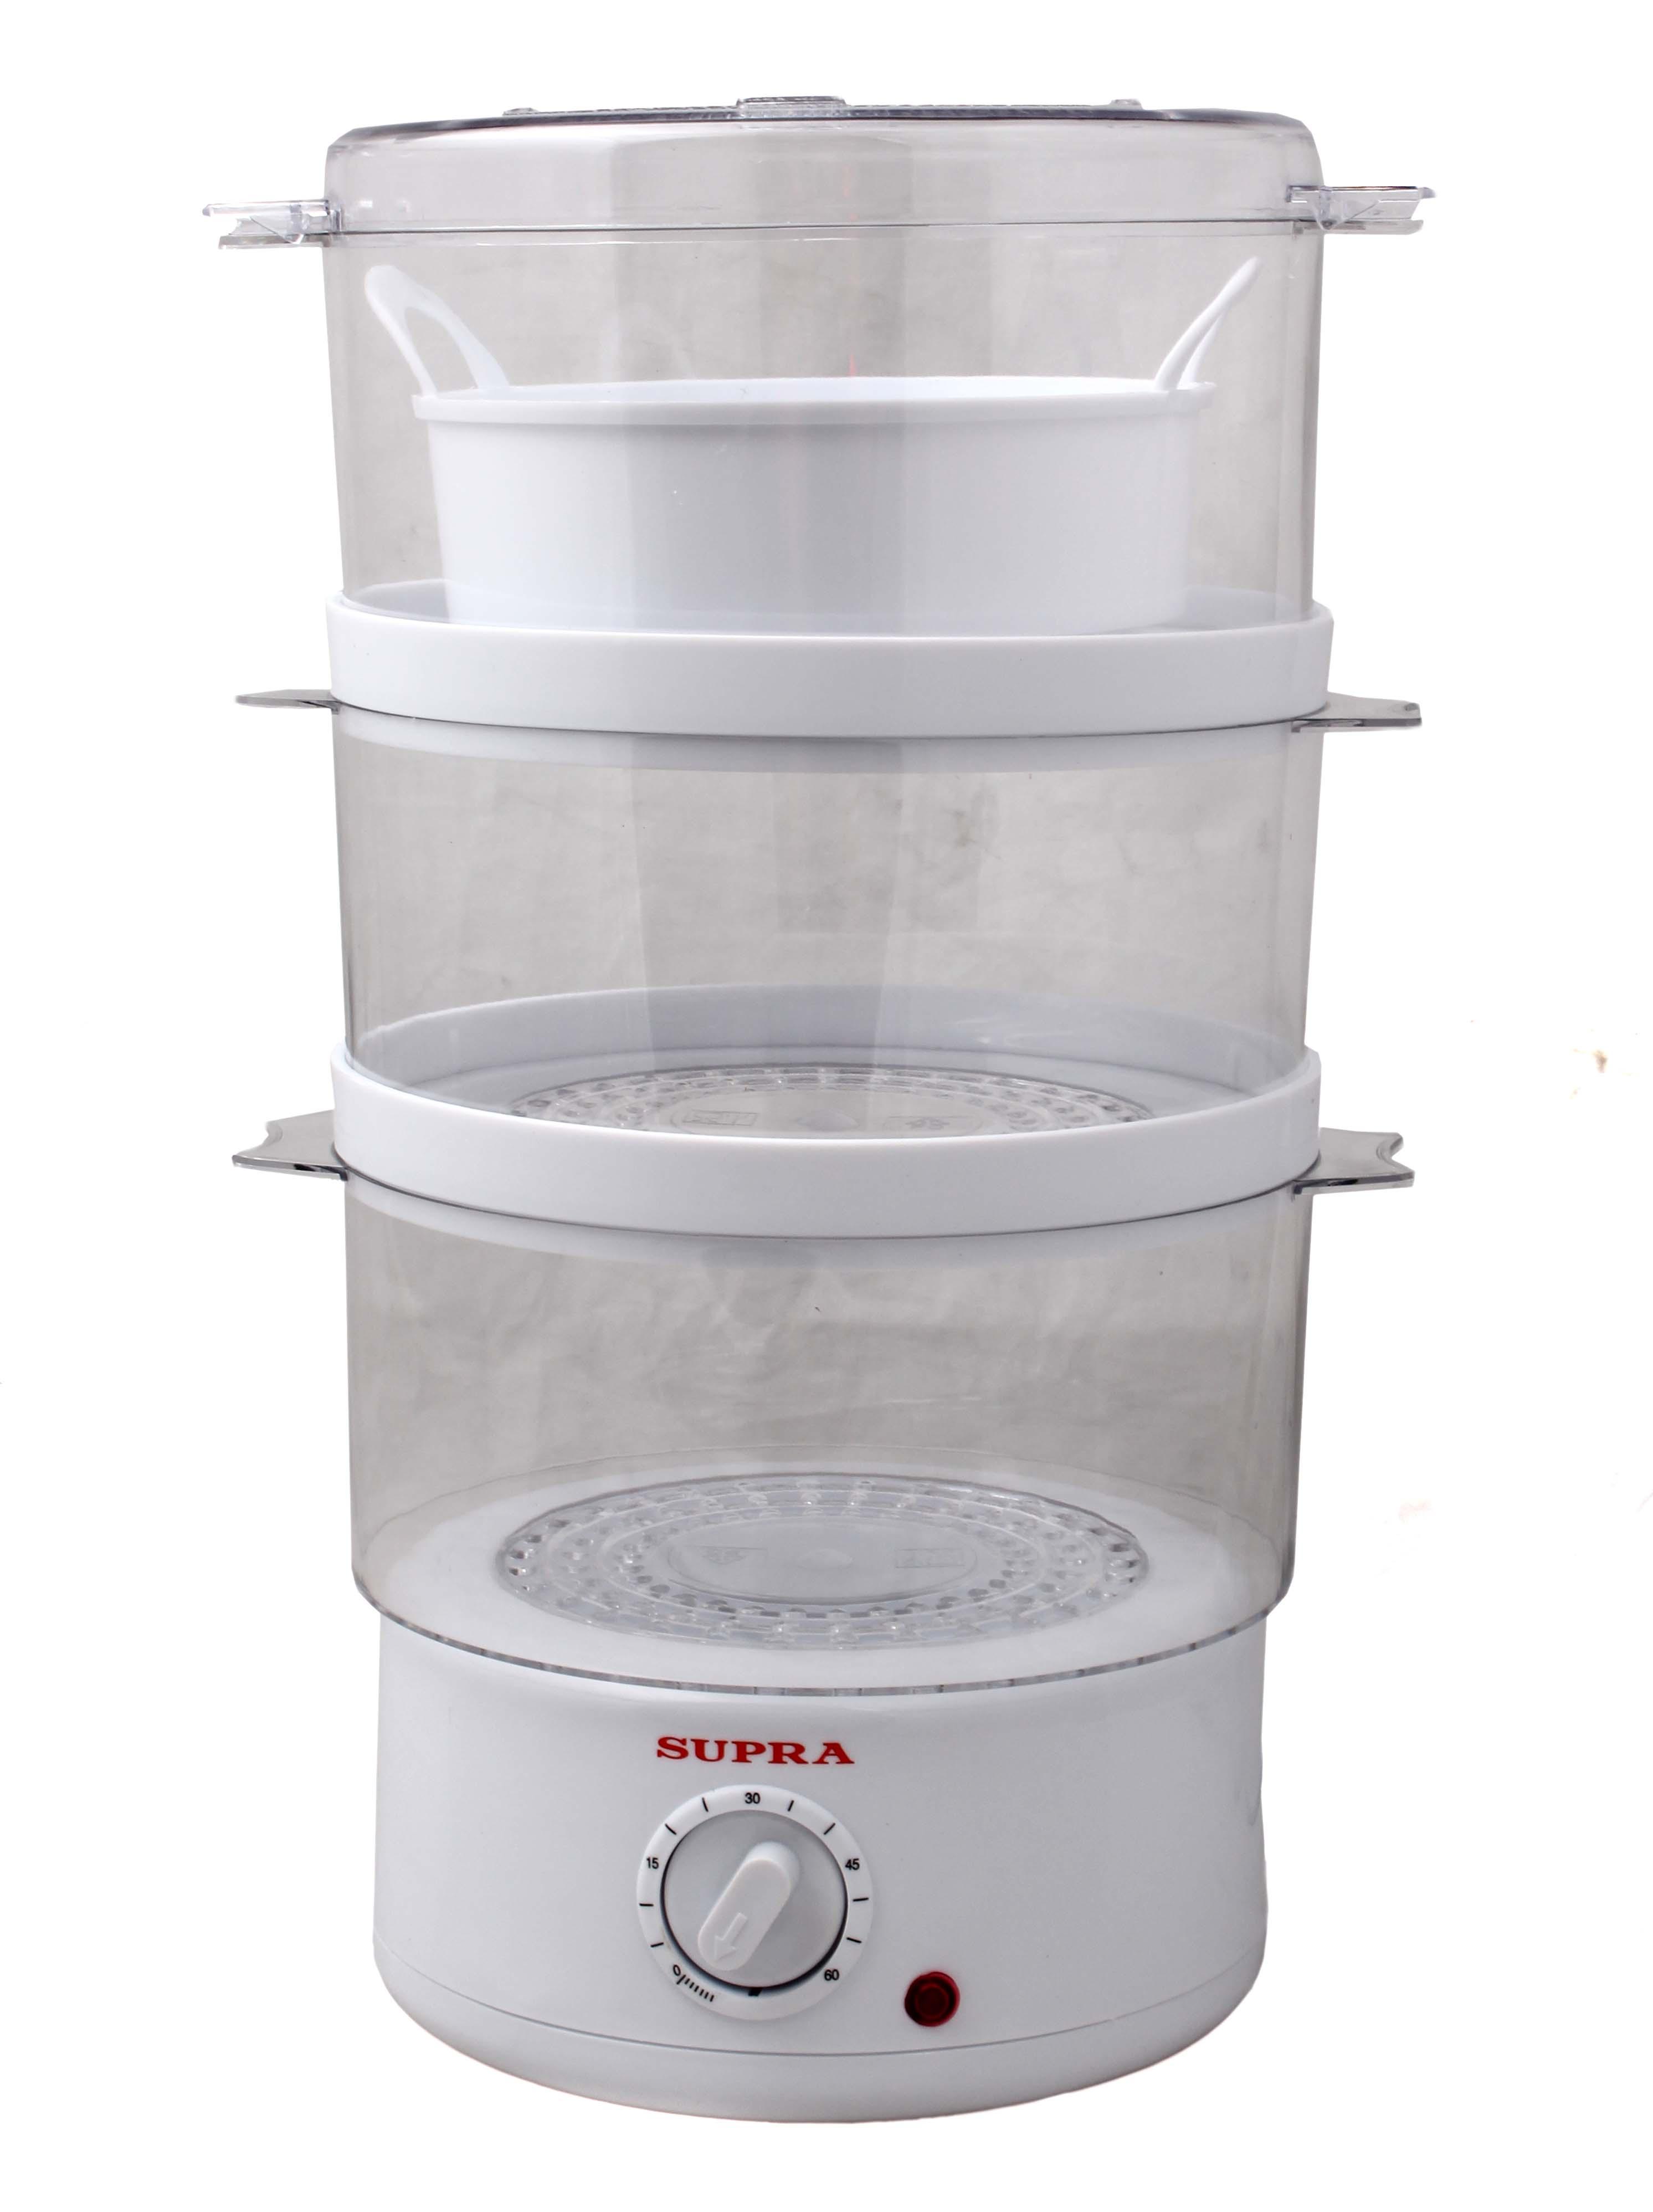 Пароварка Supra Real Brand Technics 530.000